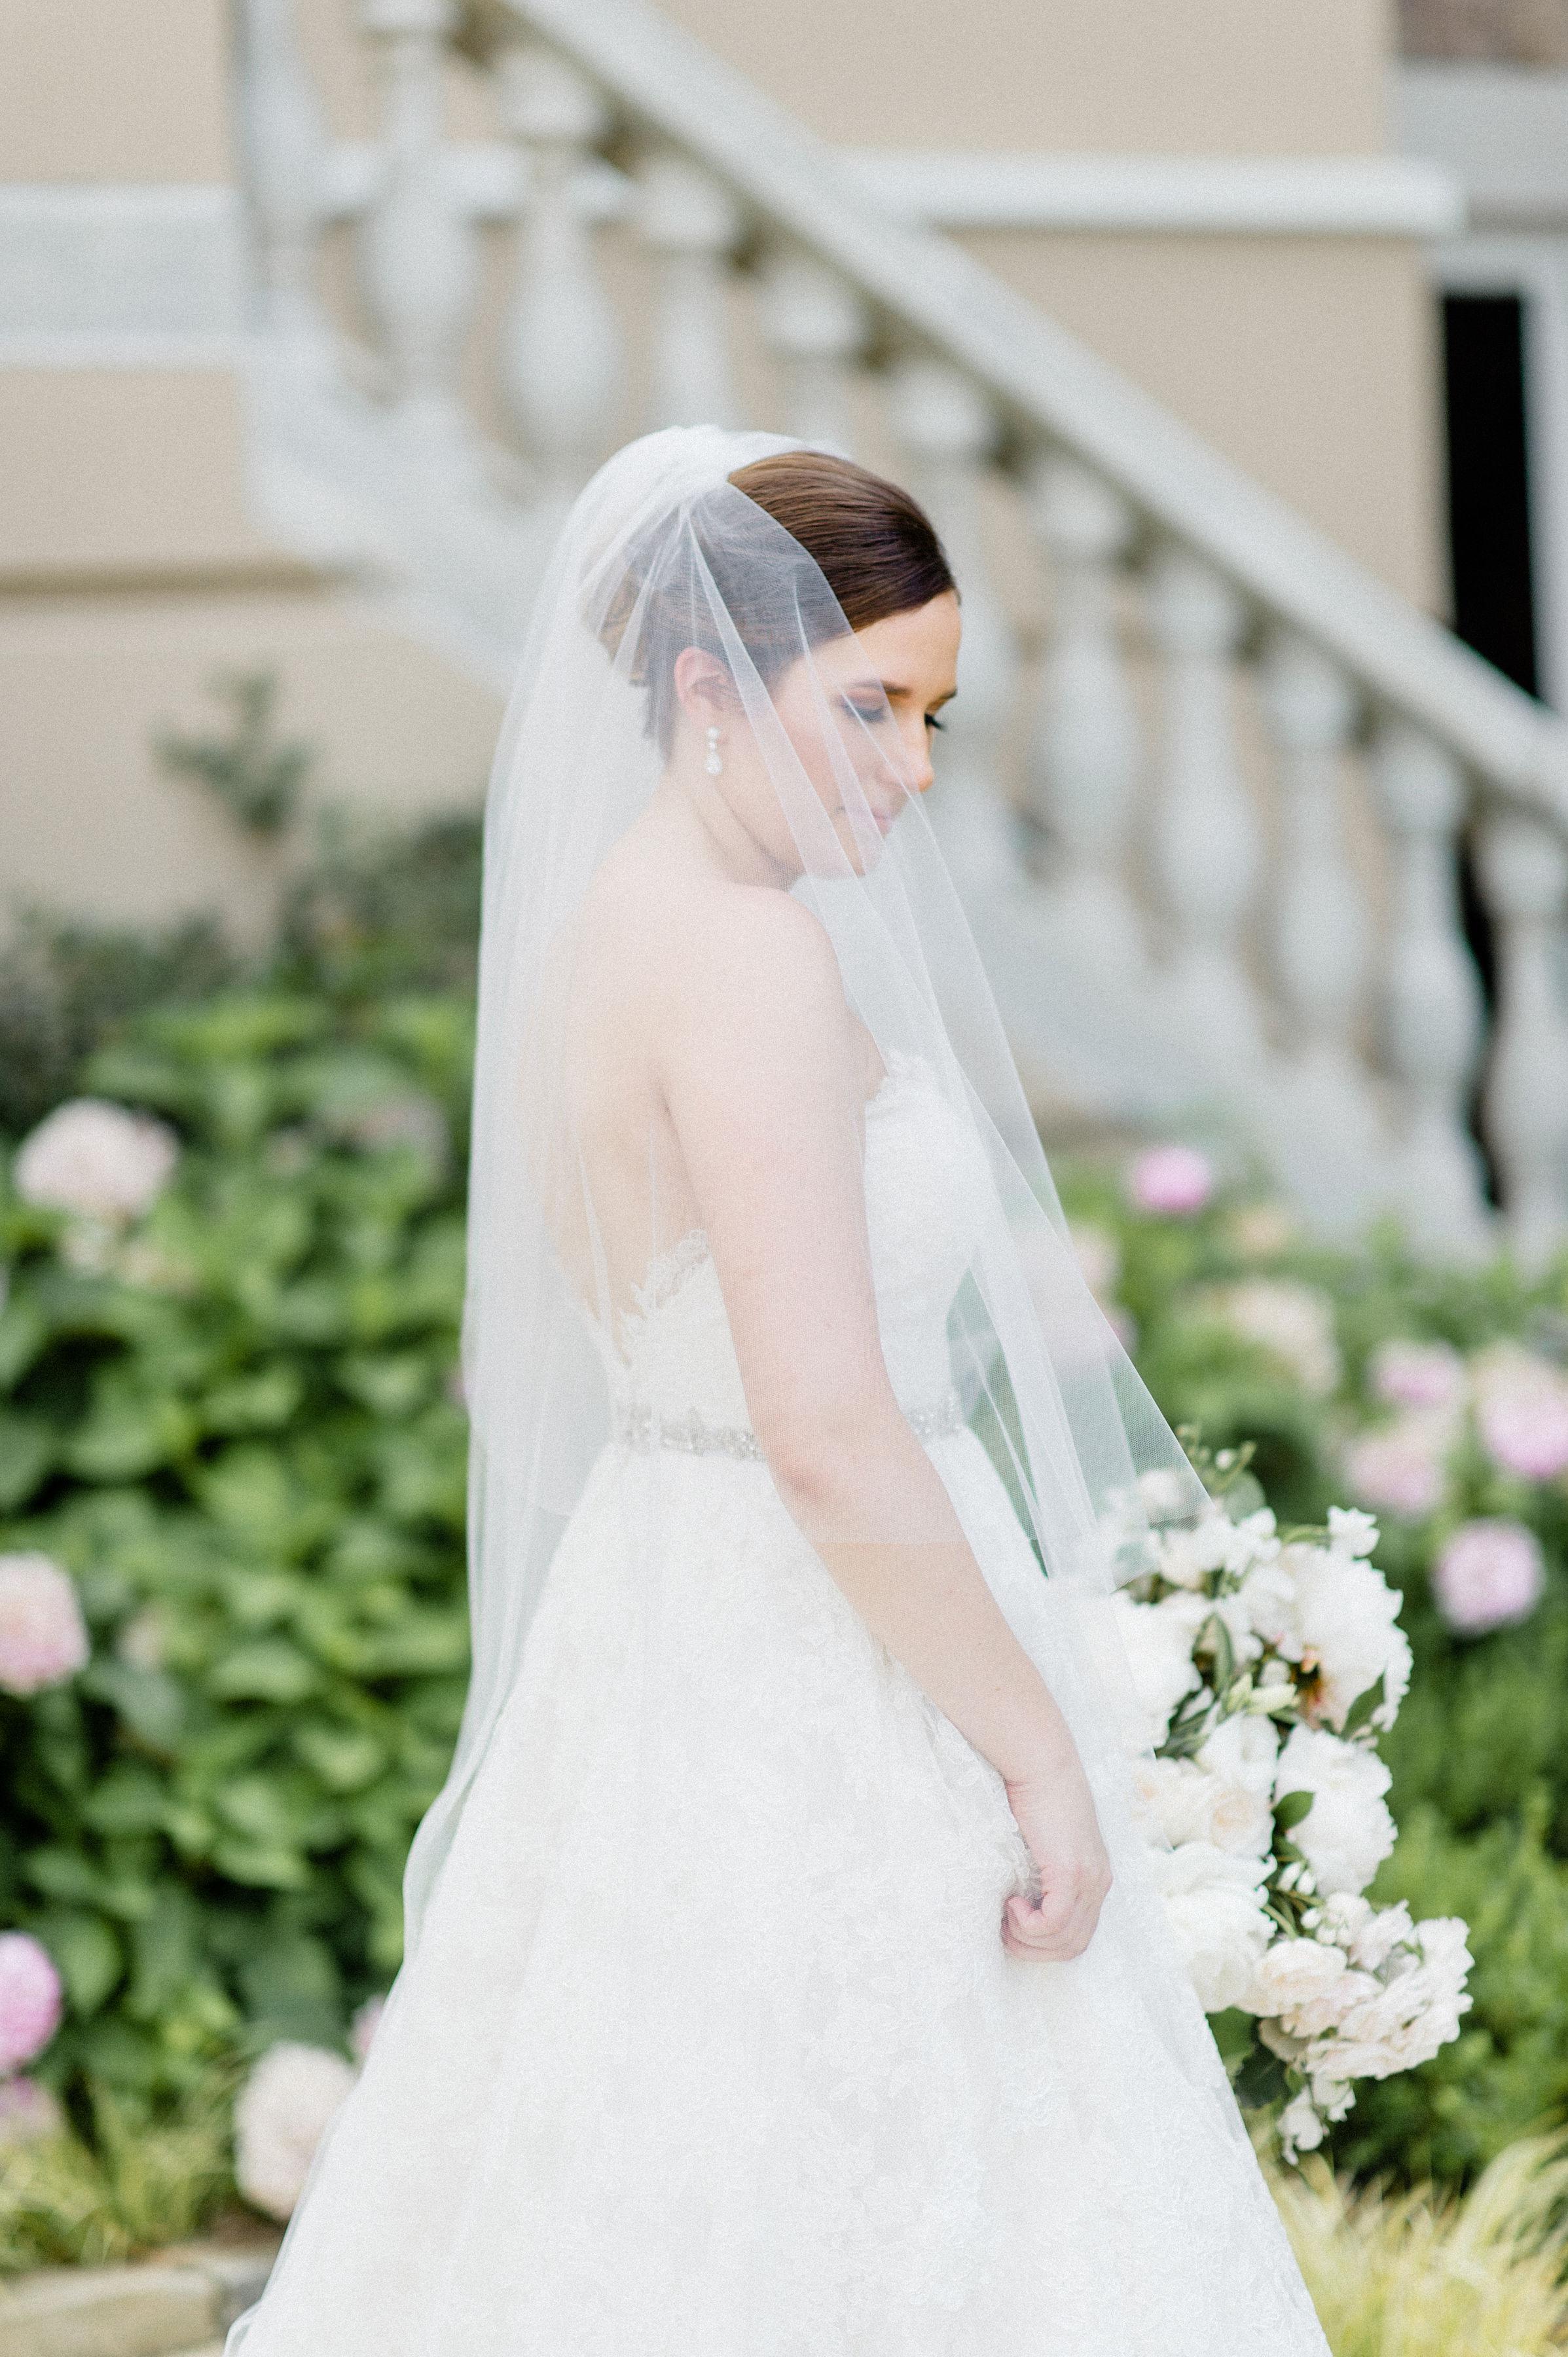 McElravey_Wedding_CarolineLimaPhotography_2018_222.jpg